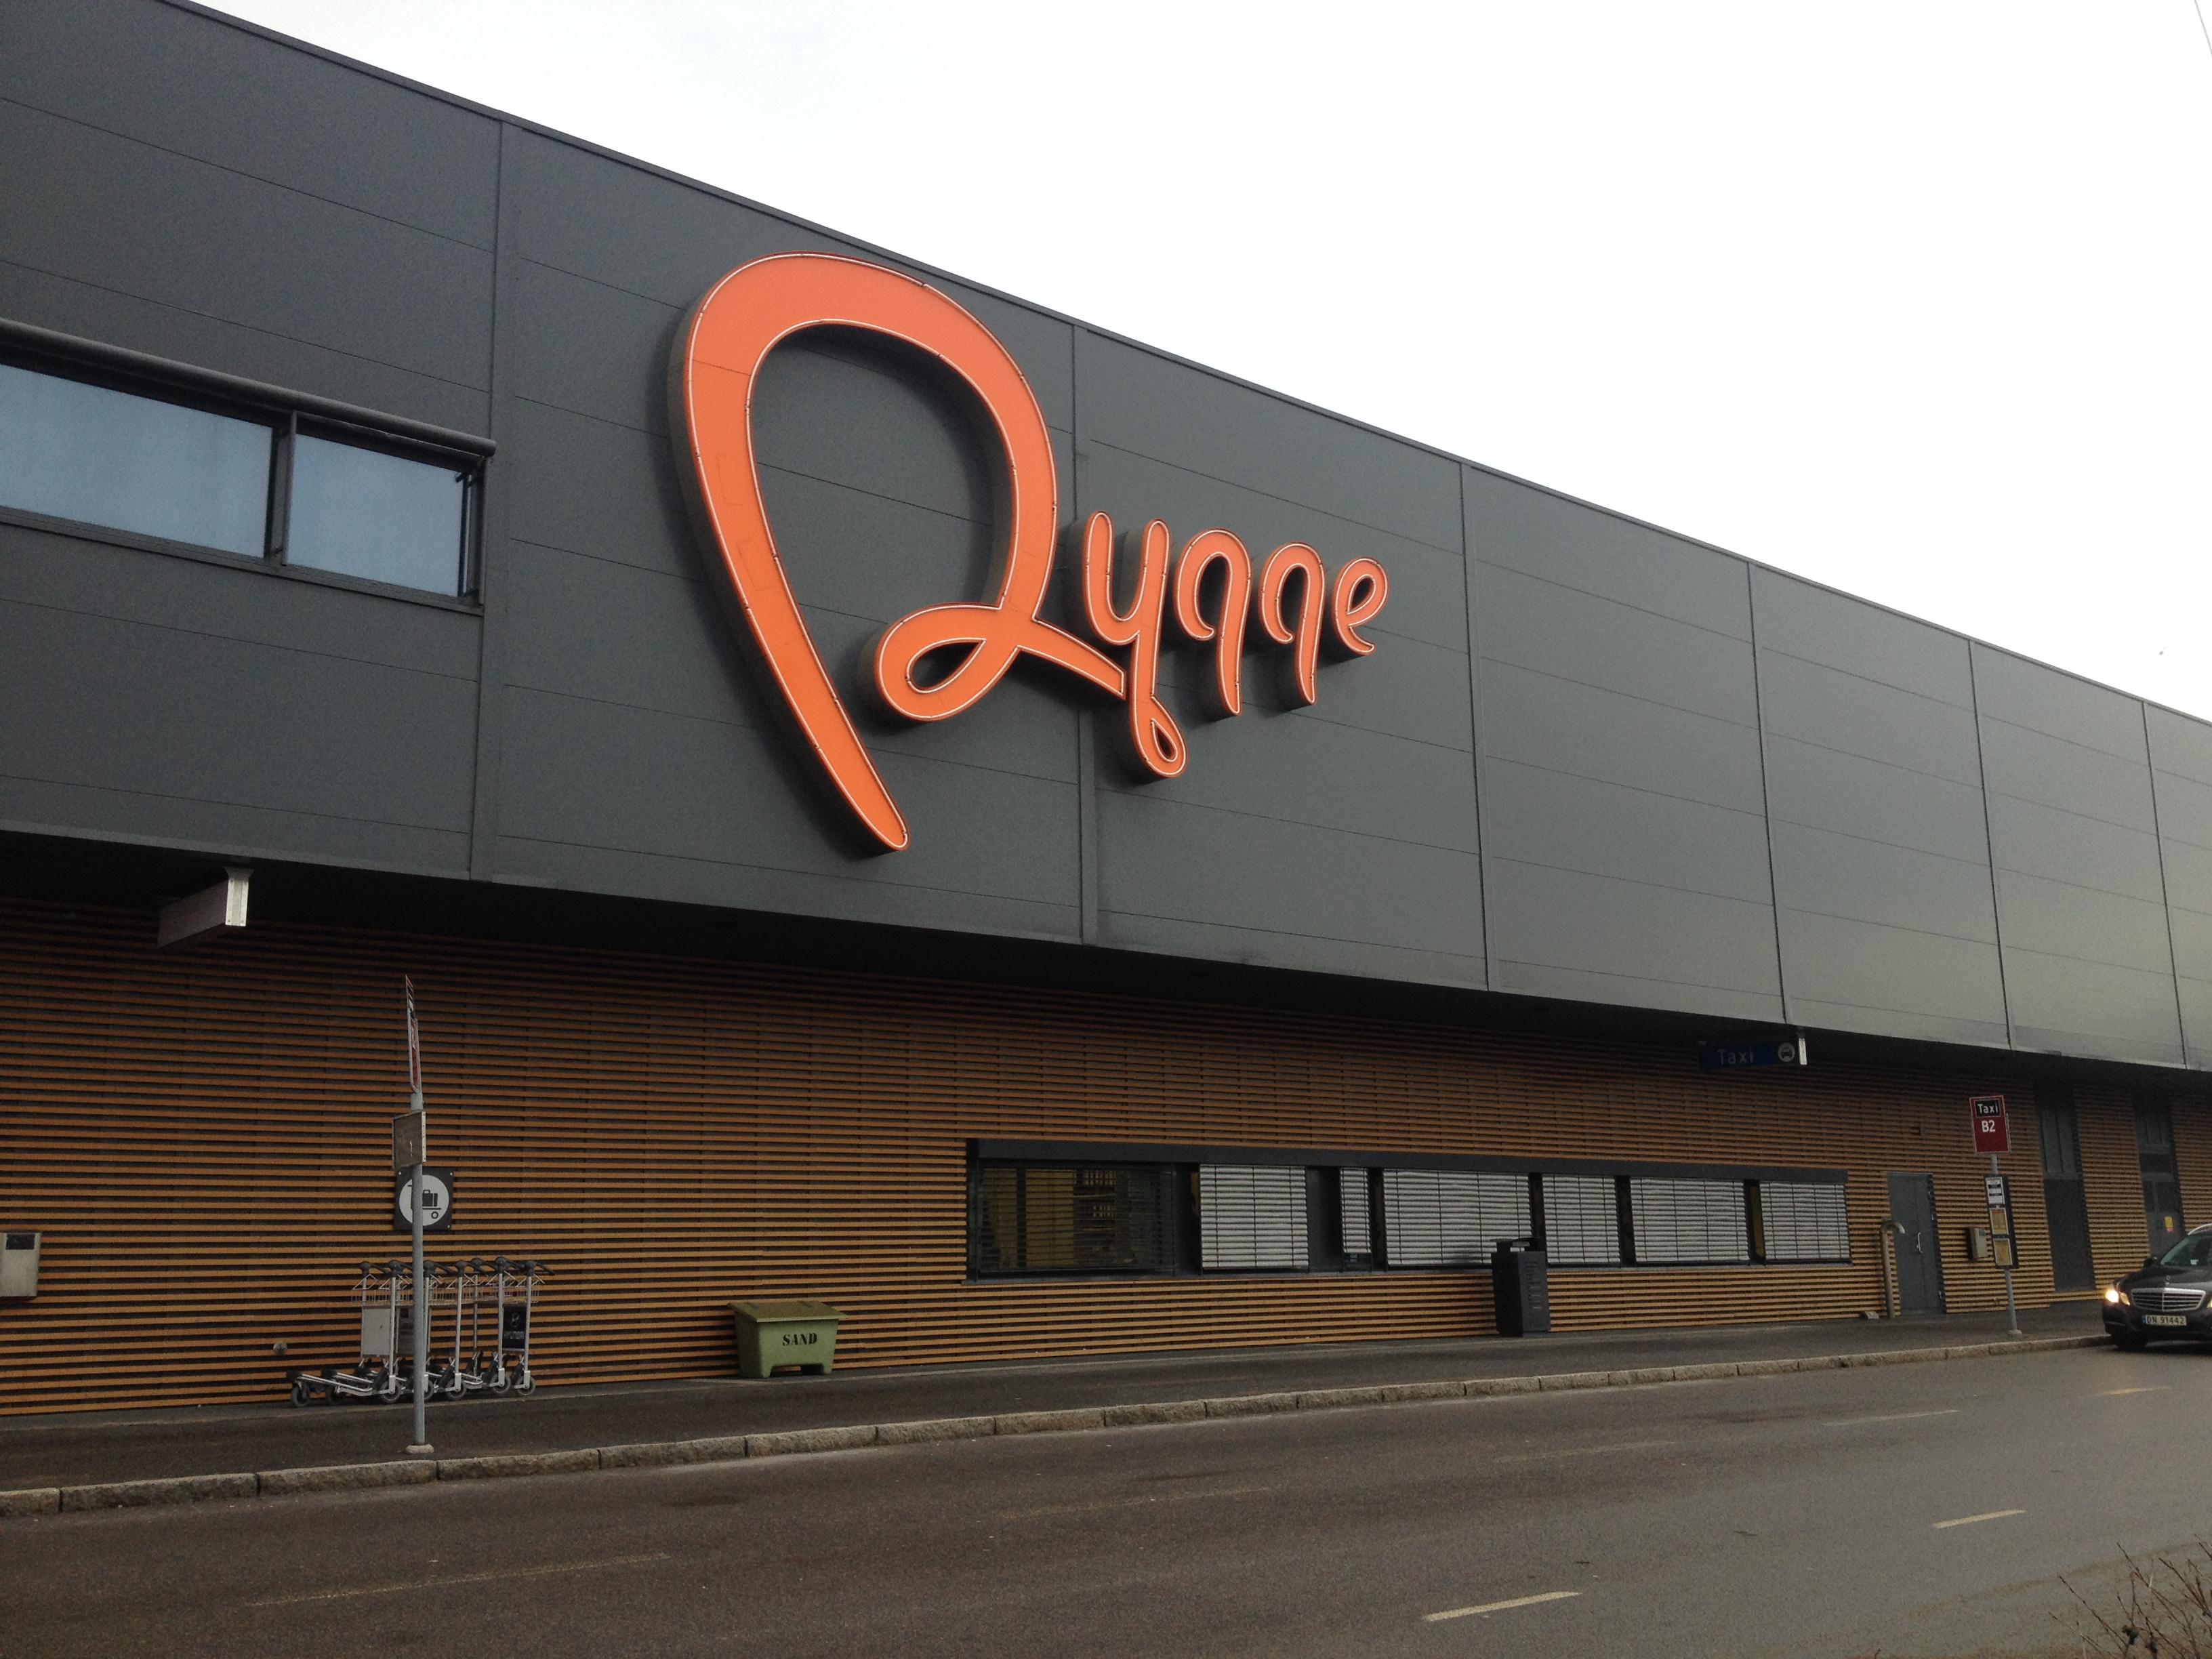 аэропорт Осло Ригге